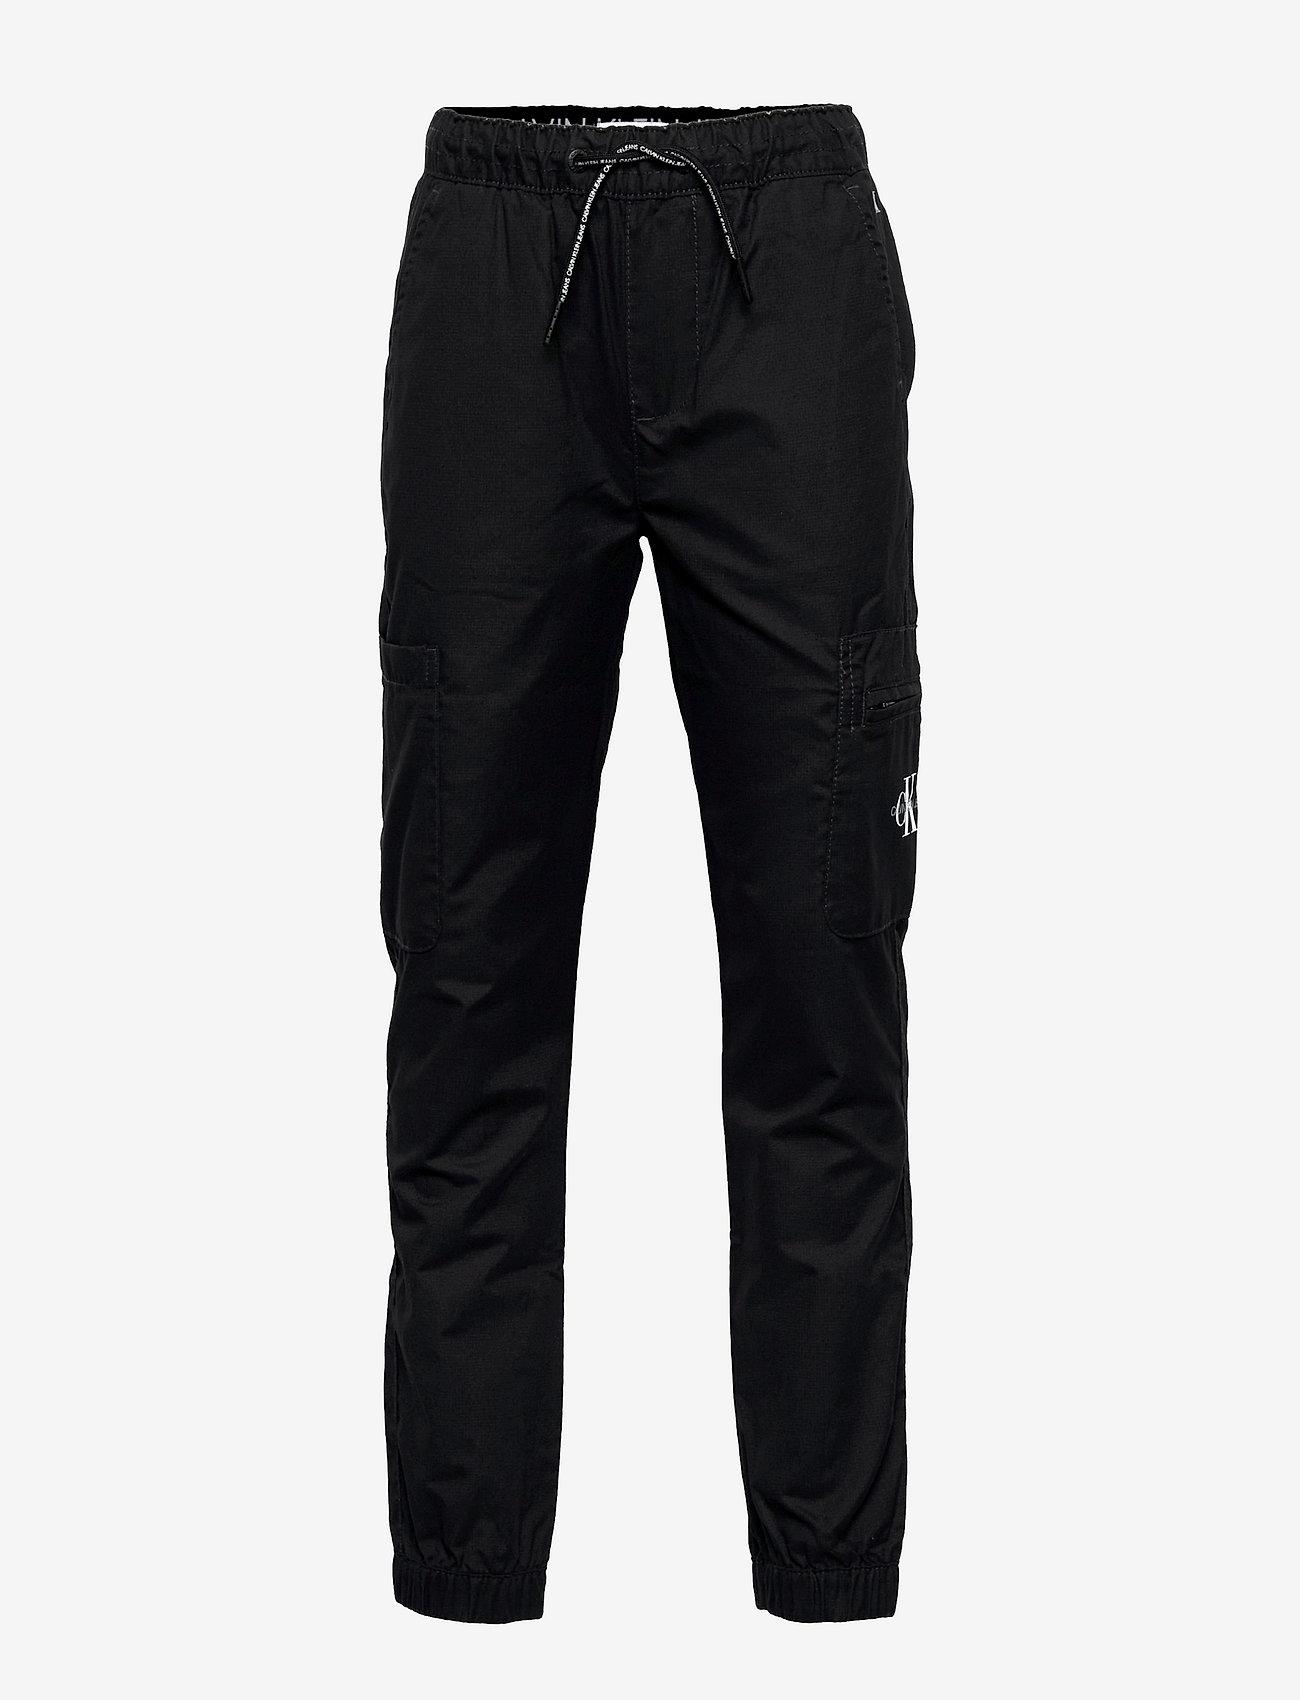 Calvin Klein - FUNCTIONAL POCKET PANTS - trousers - ck black - 0